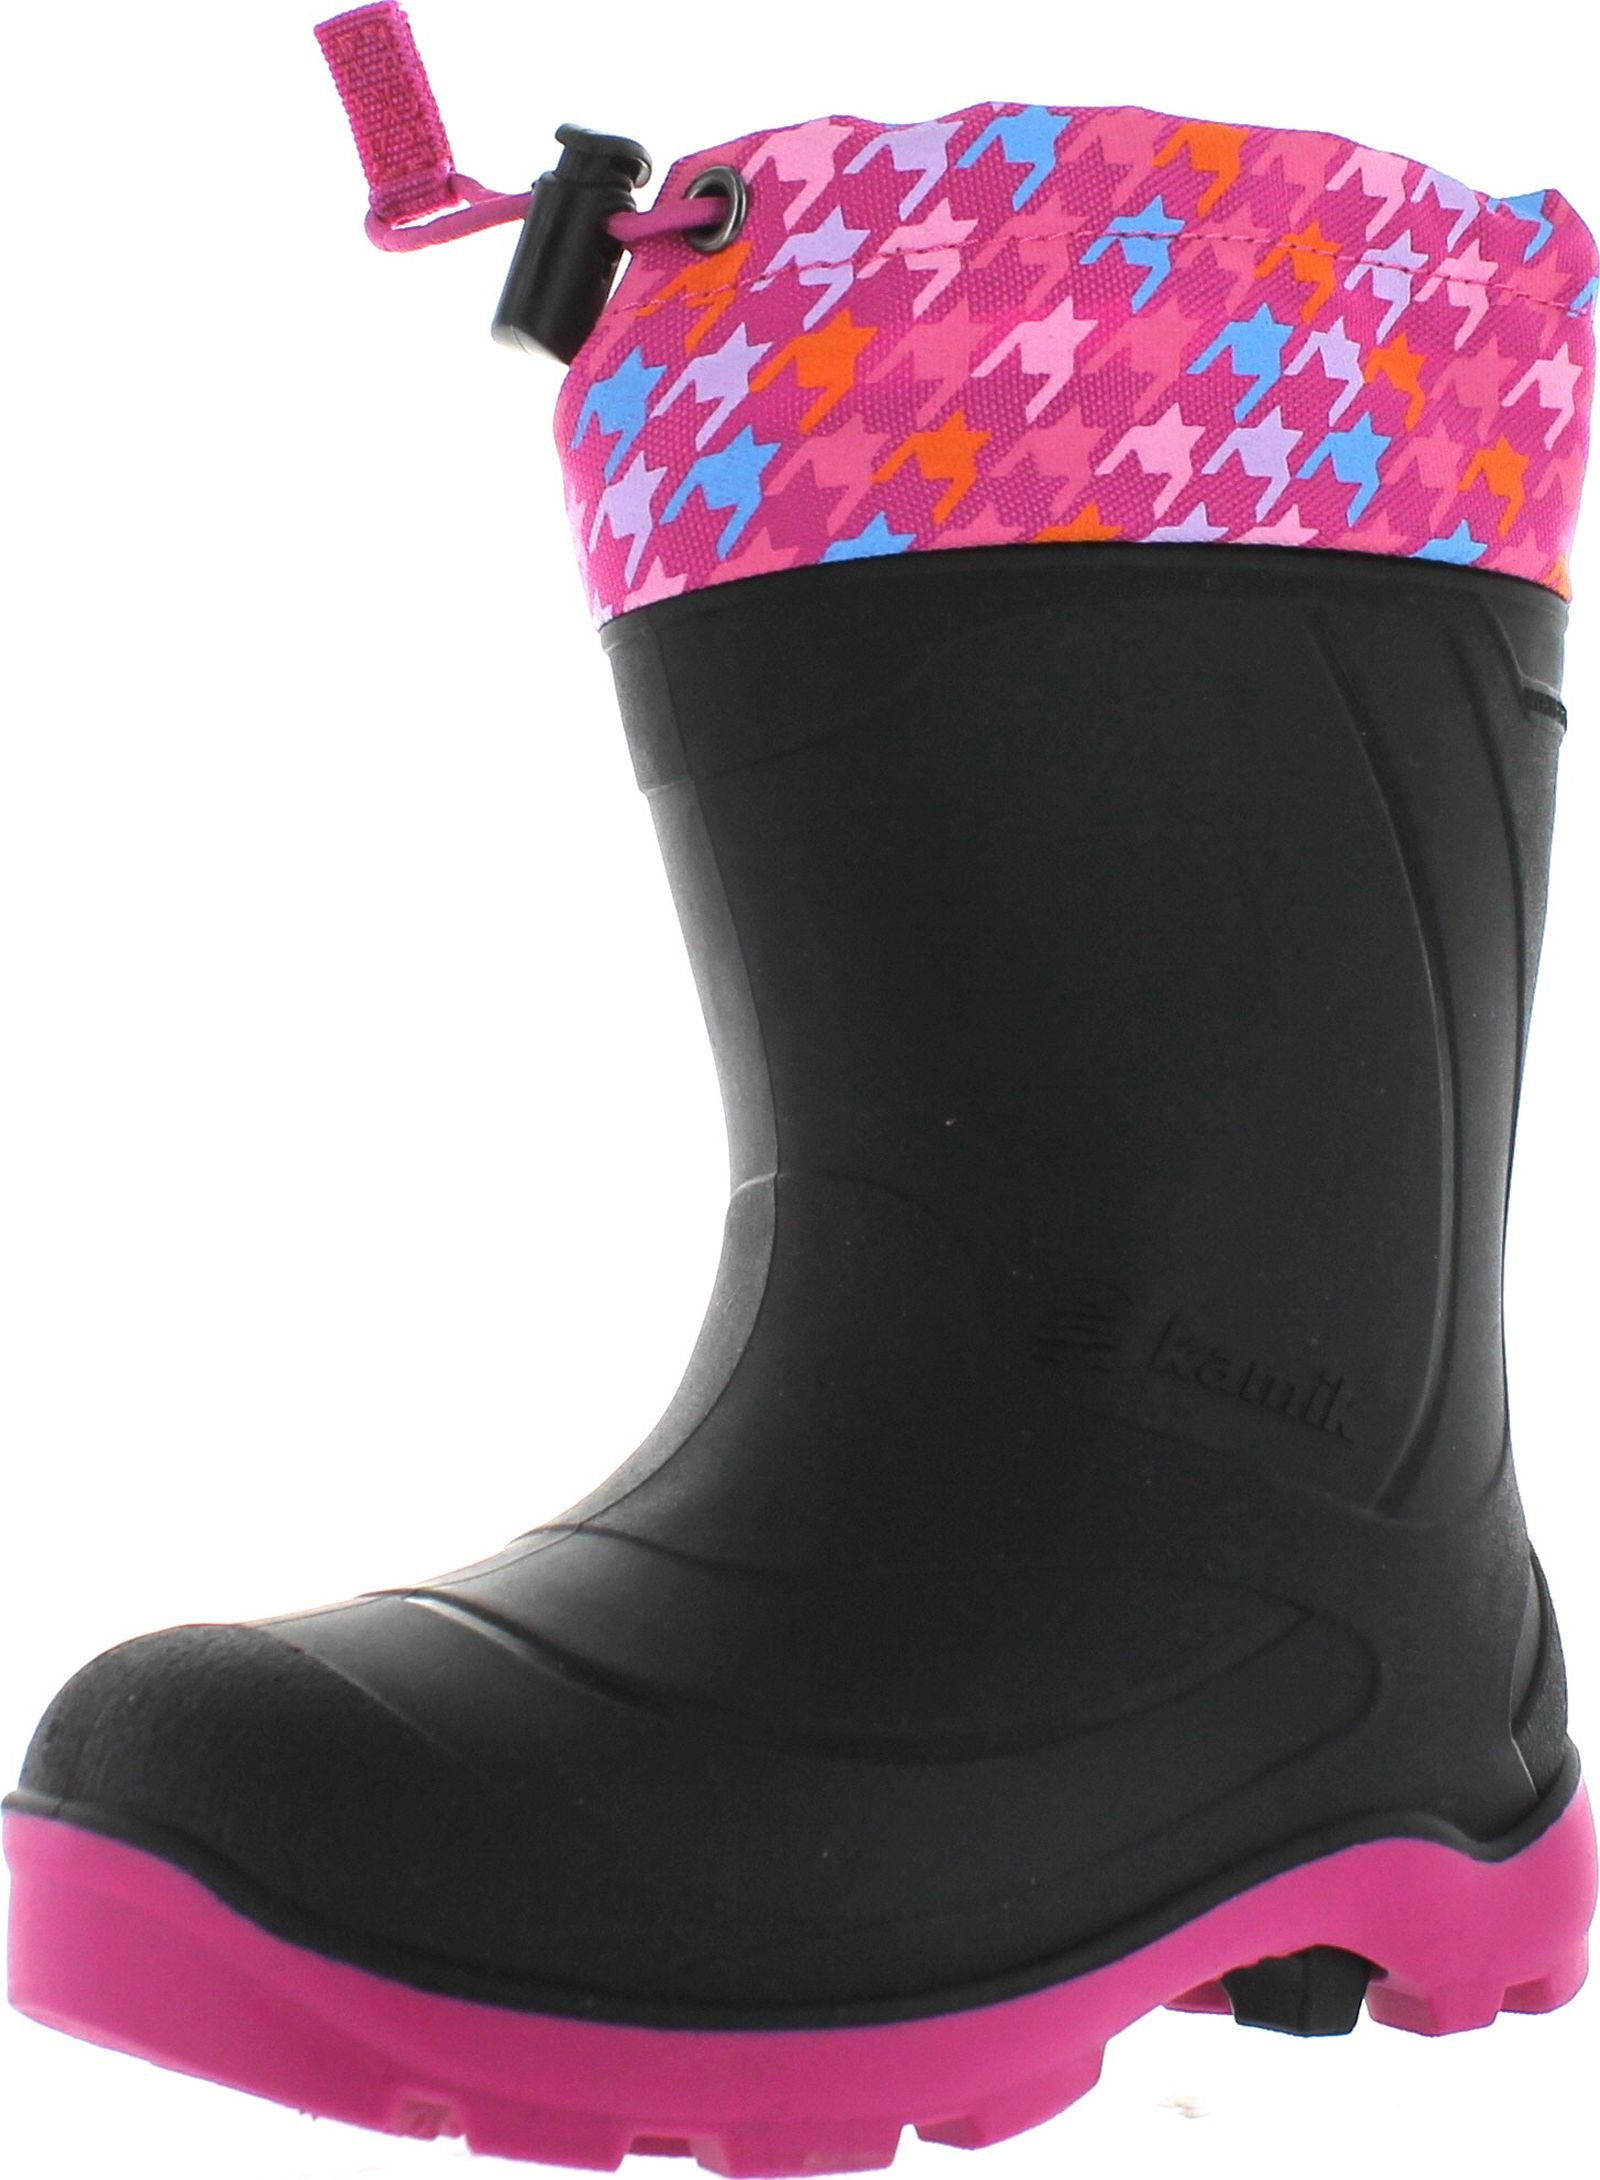 Kamik Kids Footwear Snobuster2 Insulated Boots,Magenta/Blue,9